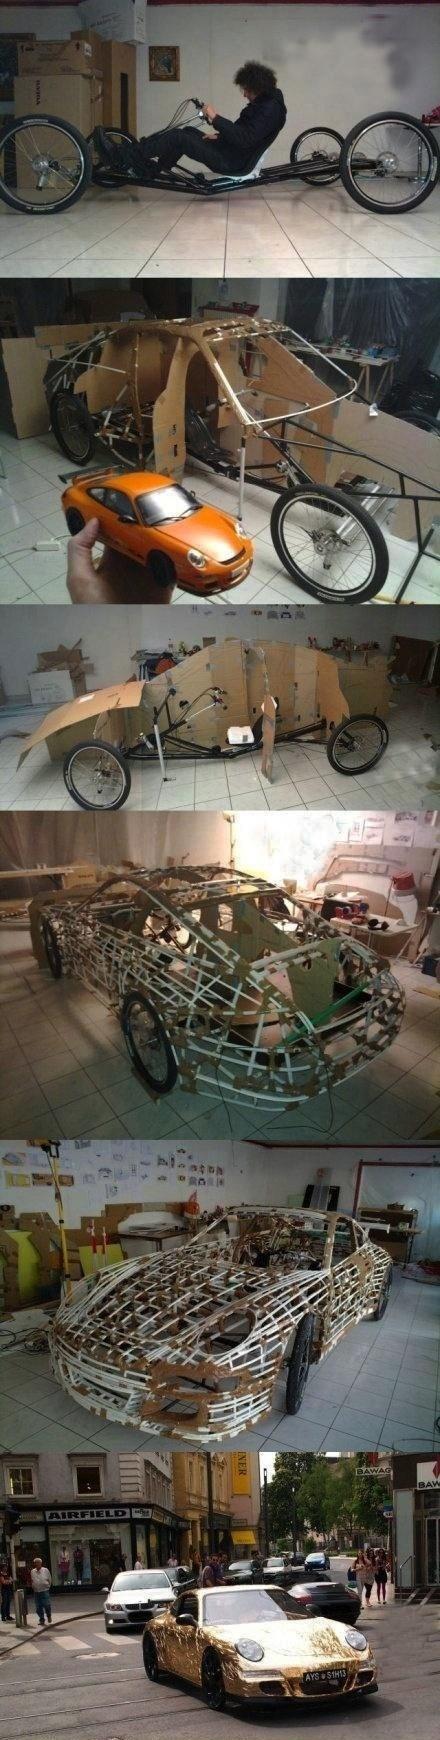 awesome bike car IRL porsche